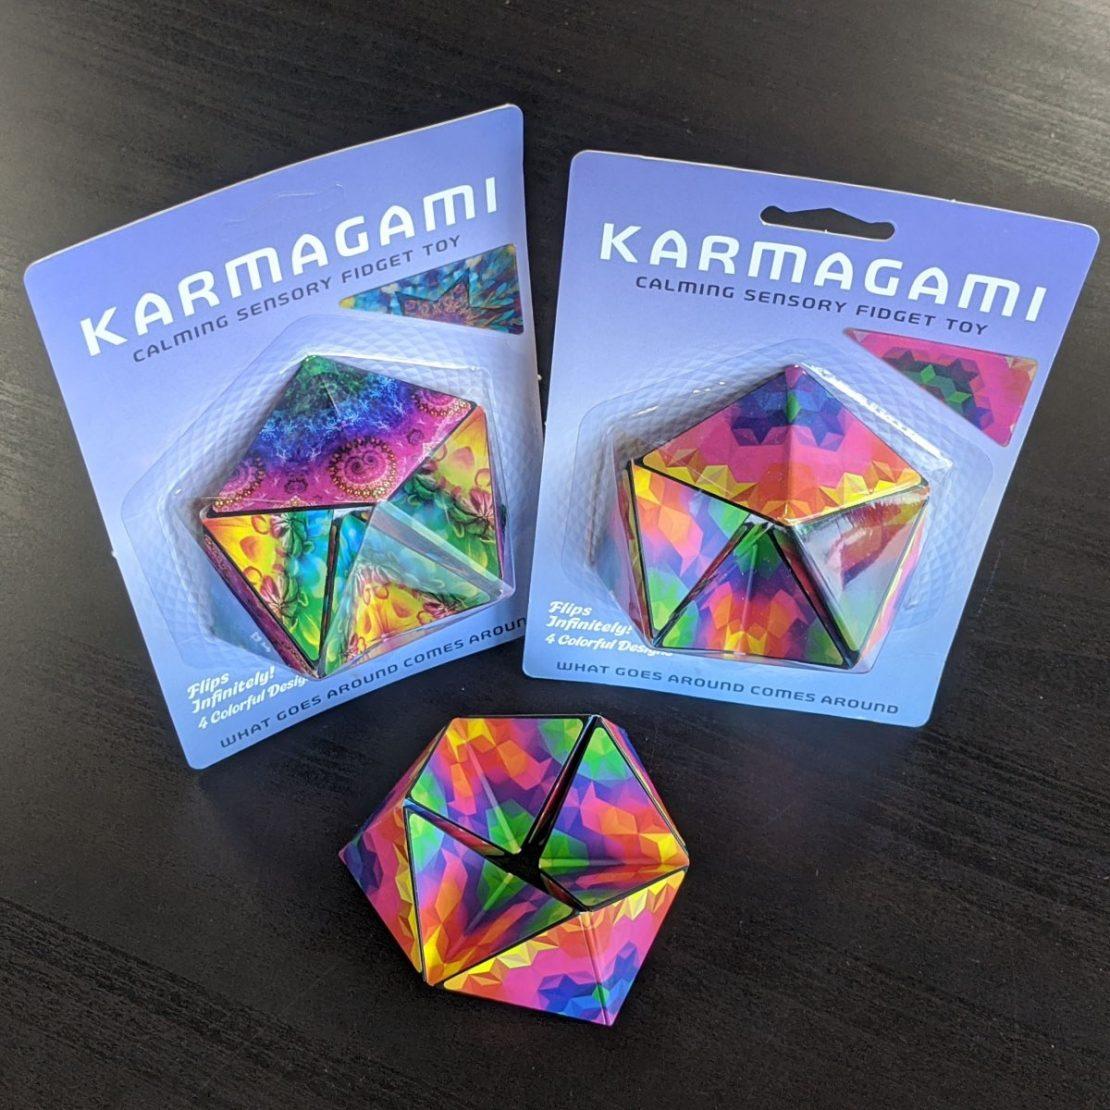 Karmagami